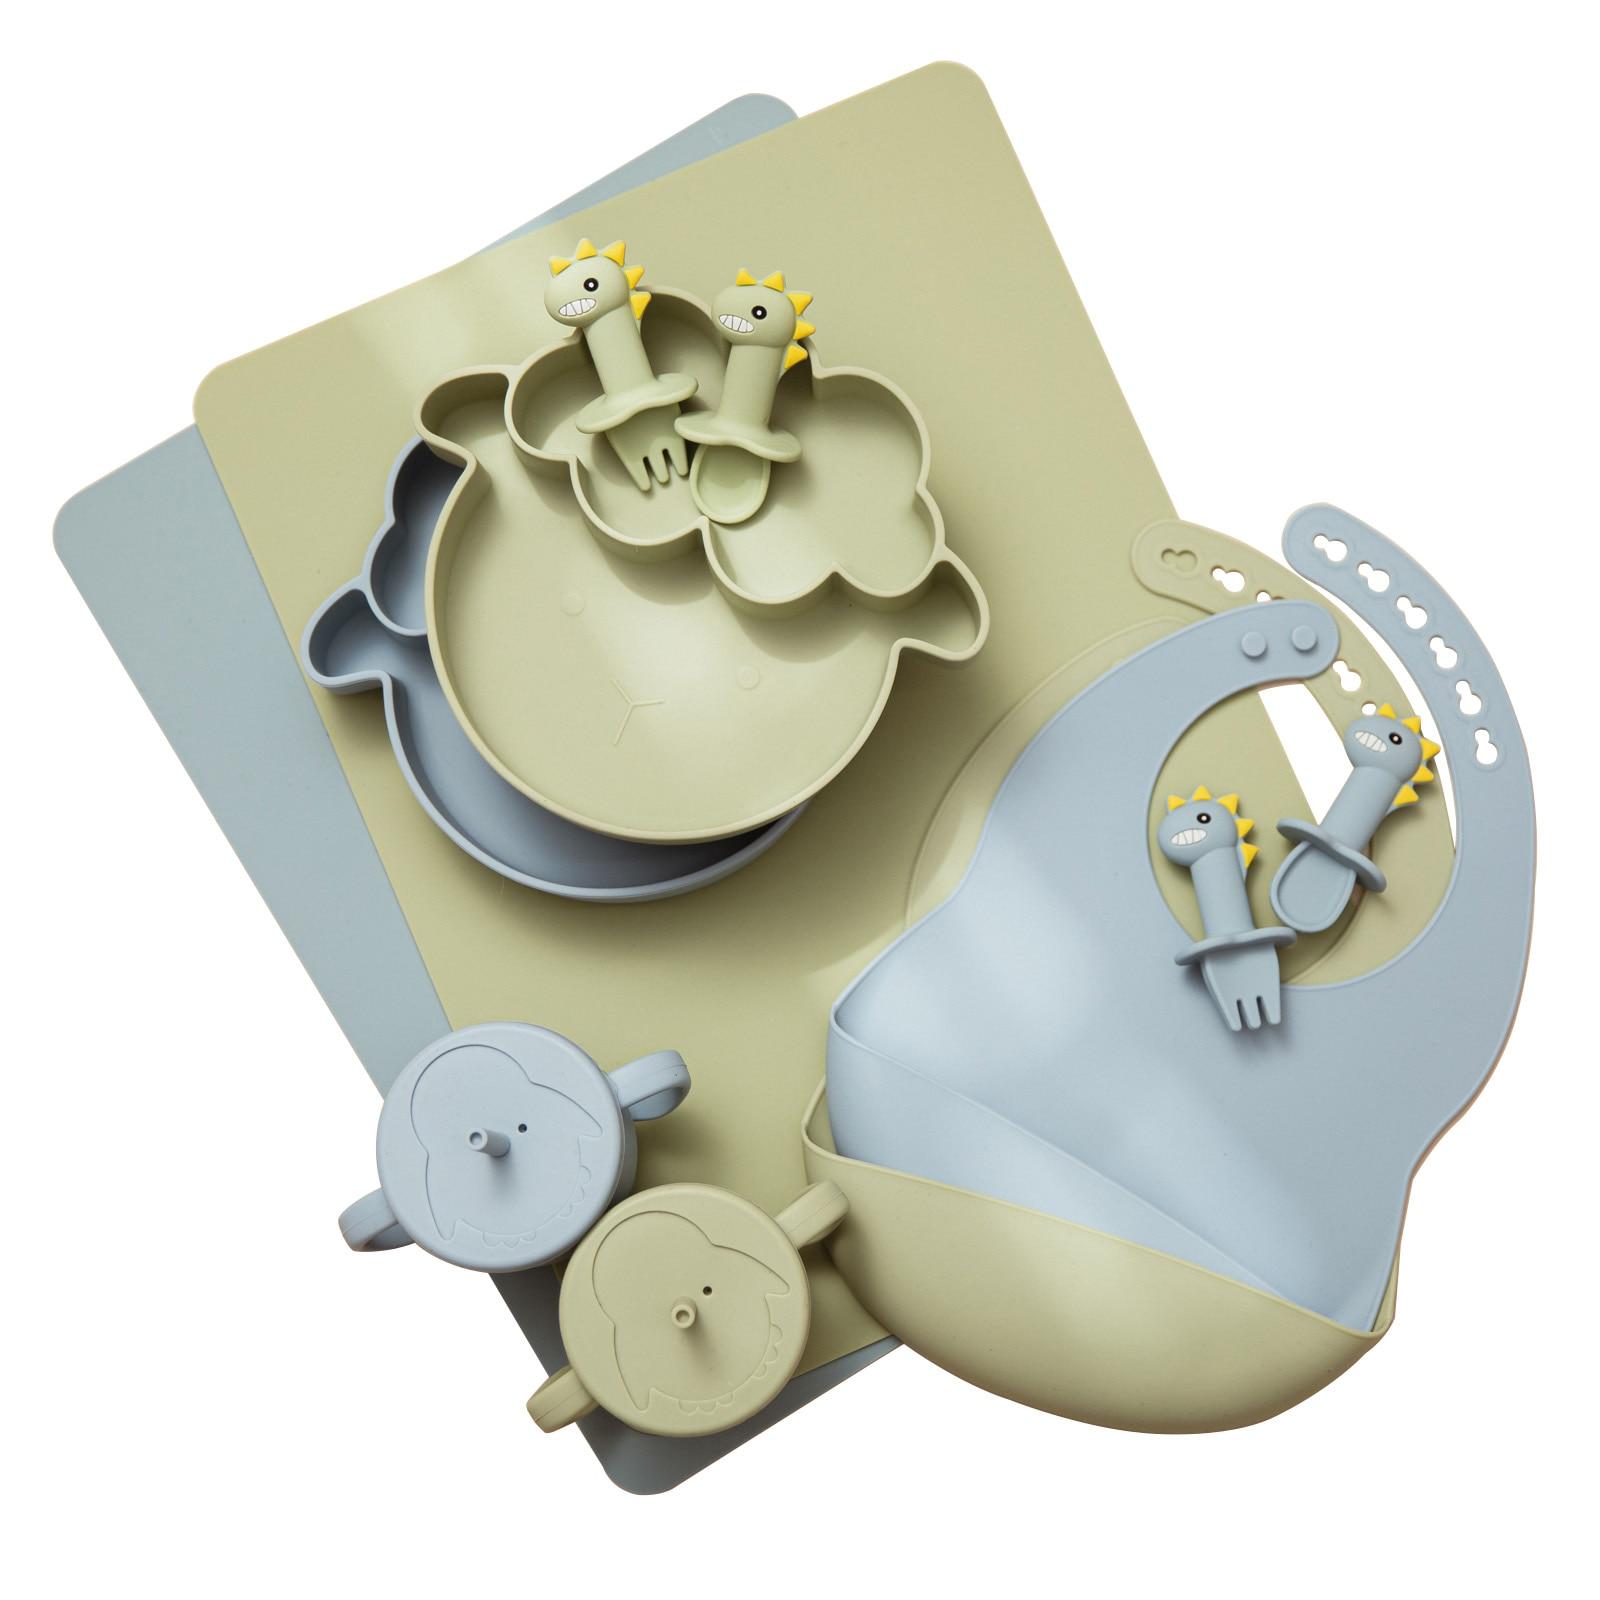 Baby Feeding Tableware 6PCS Food Grade Silicone Plate Bib Placemat Dinosaur Spoon Feeding Cup Set BPA Free Newborn Supplies